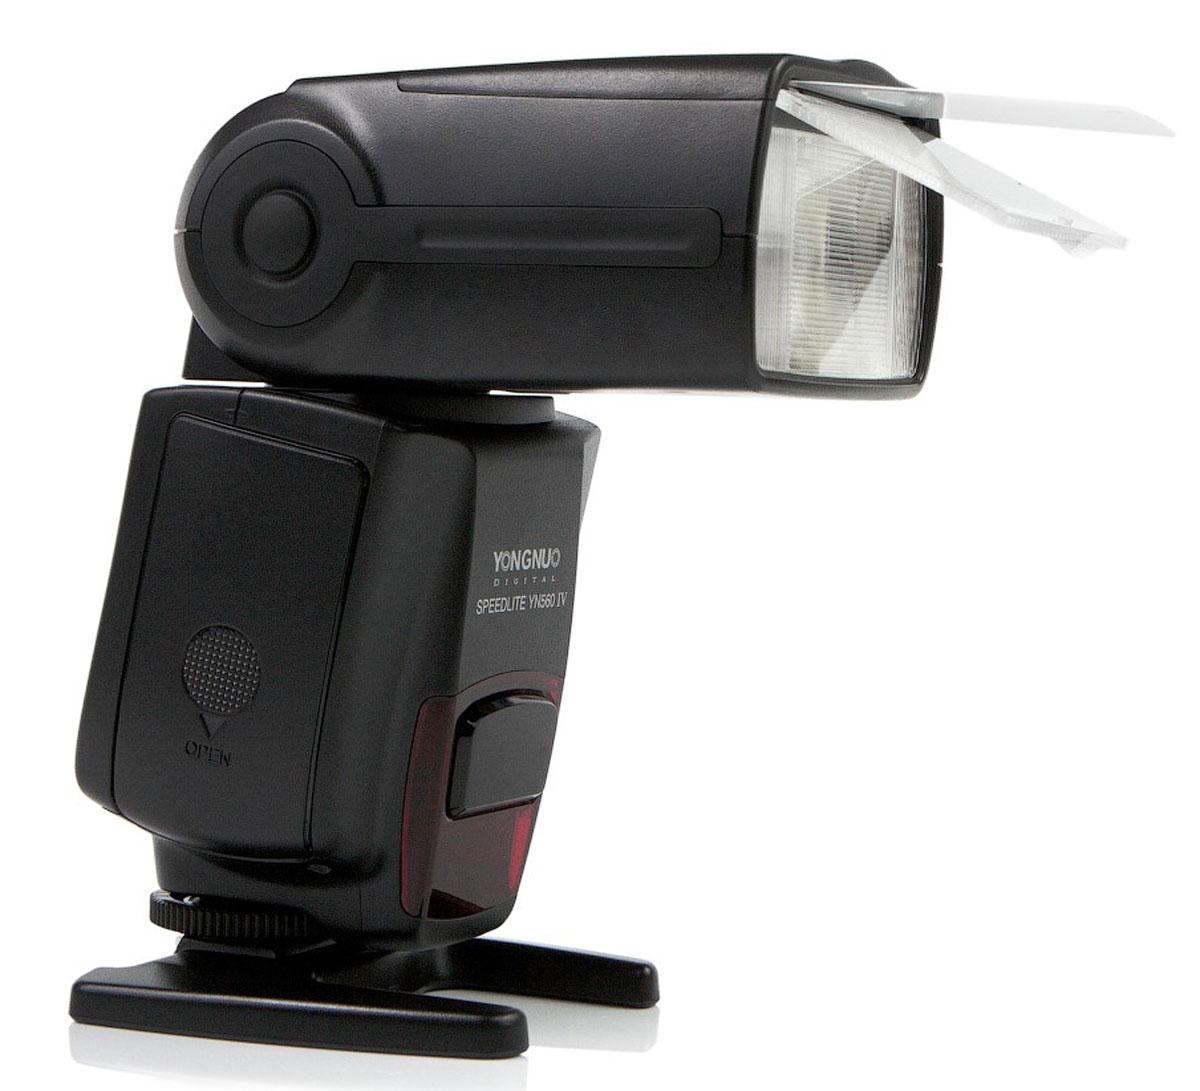 Вспышка YongNuo Speedlite YN-560IV со встроенным радиосинхронизатором для Canon, Nikon, Pentax, Olympus, Sony стоимость